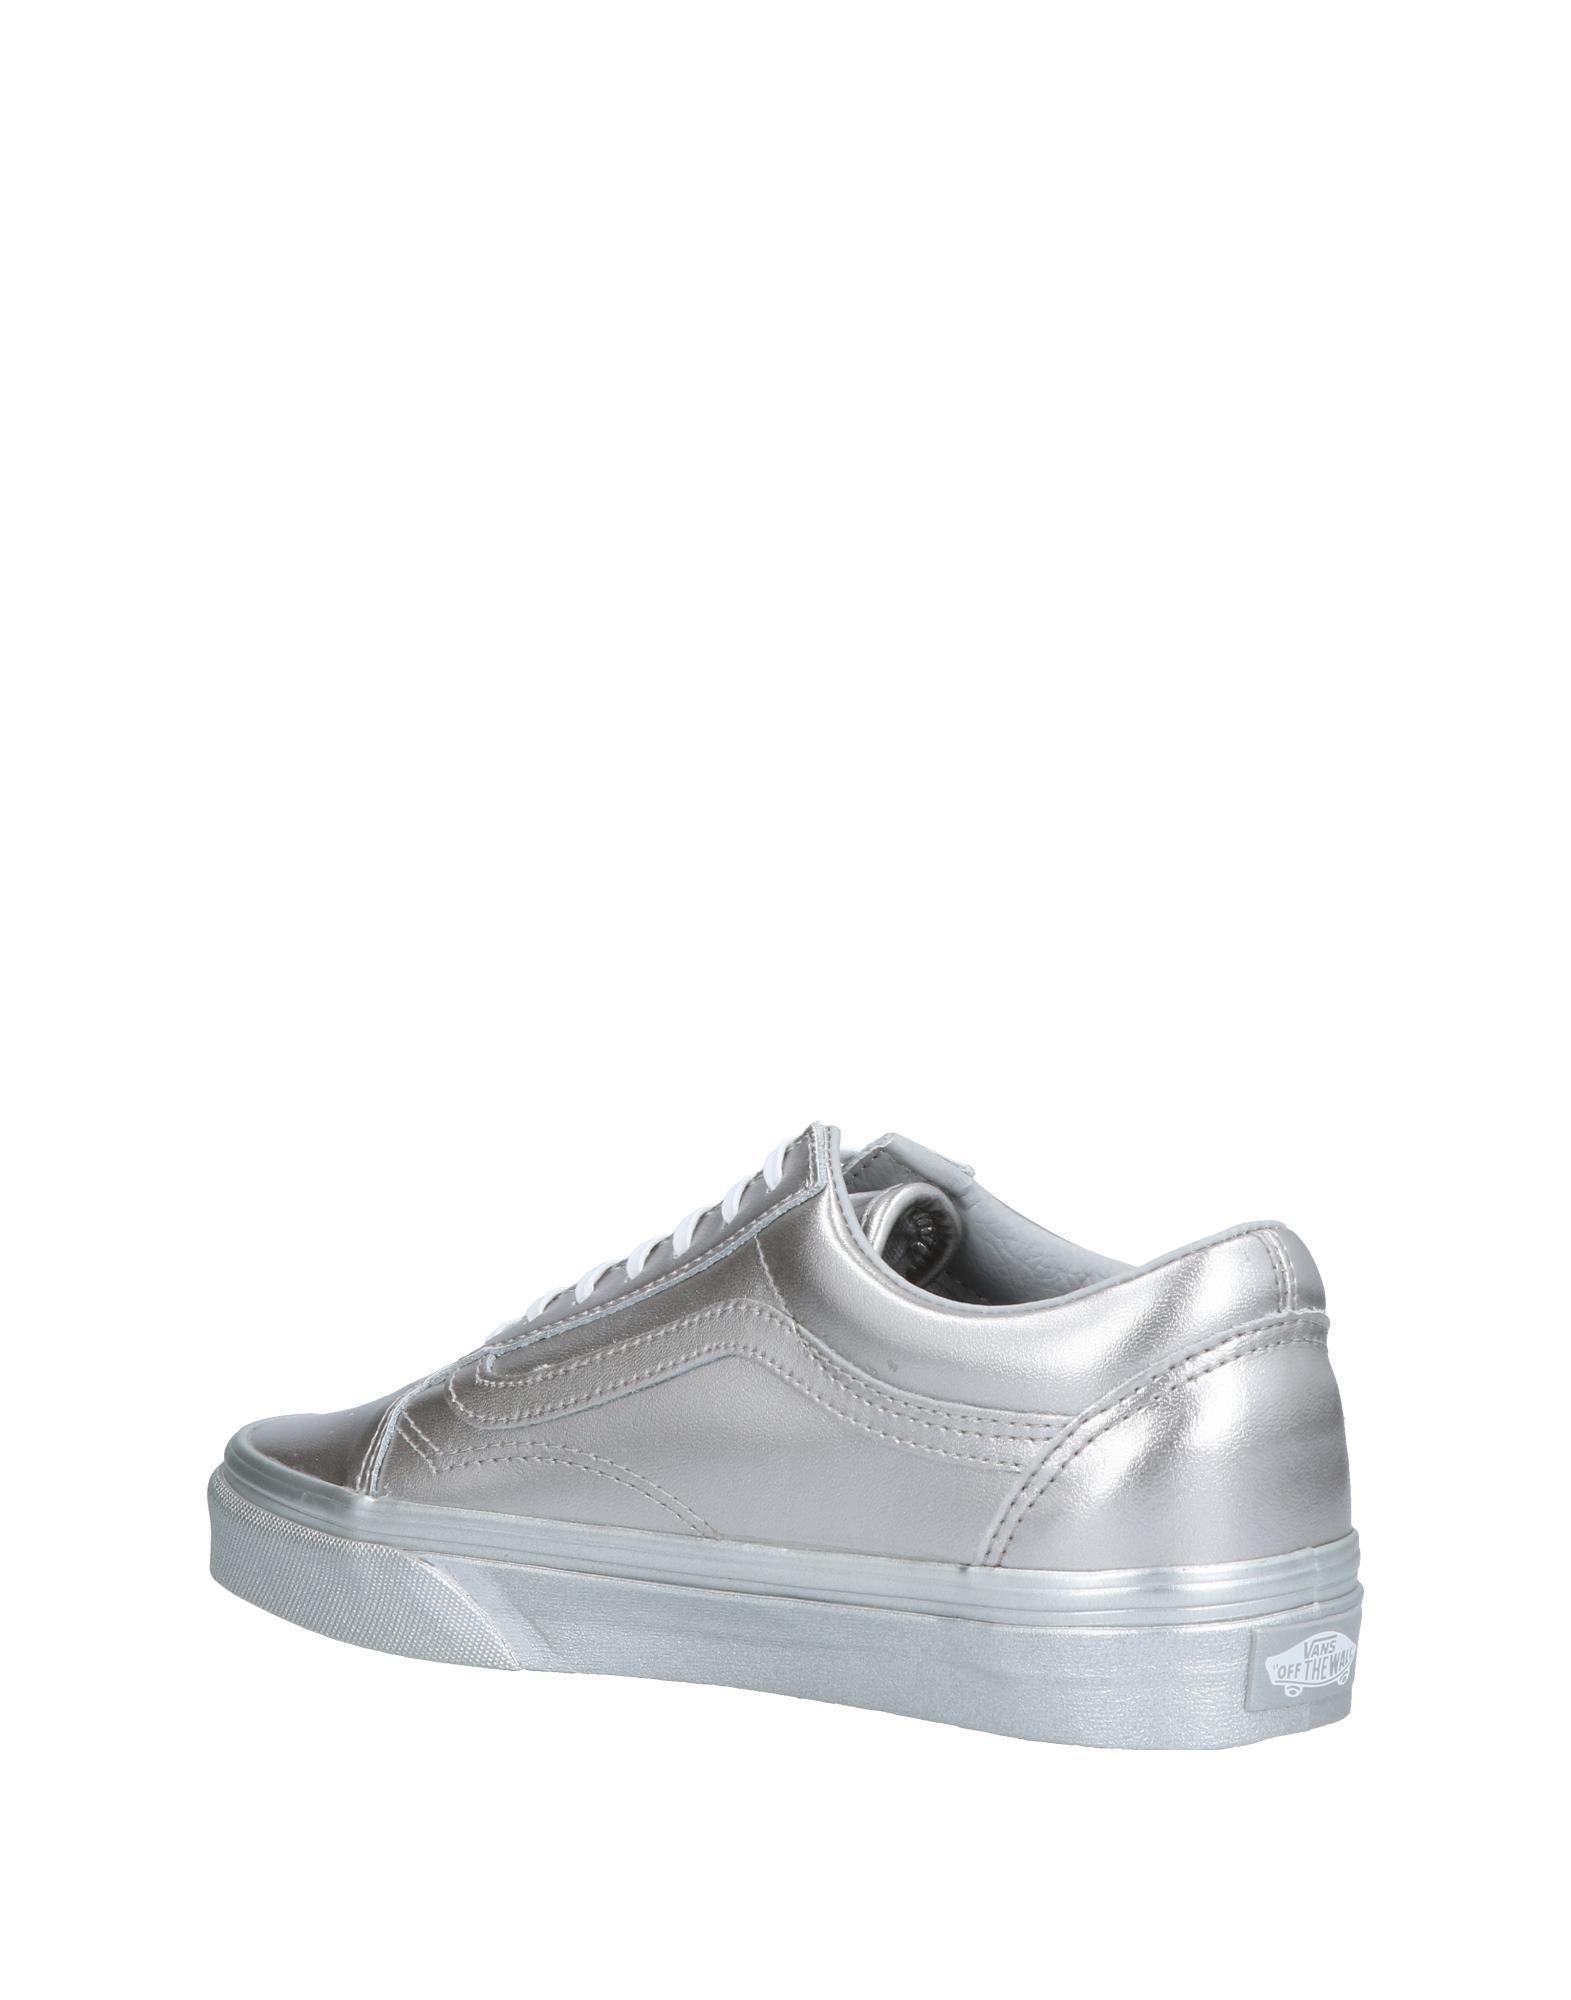 Vans Leather Low-tops & Sneakers in Silver (Metallic)